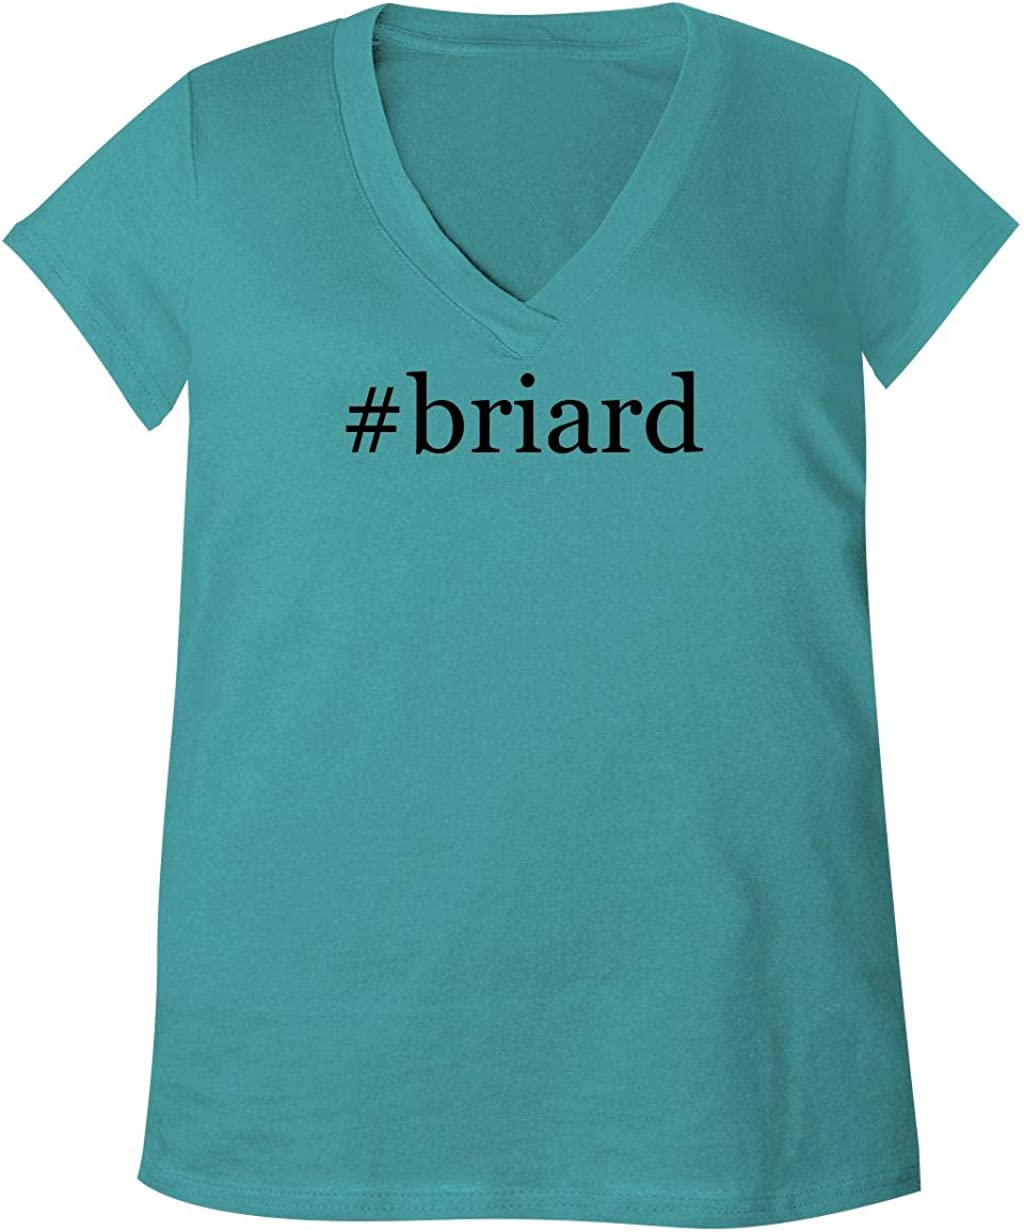 #Briard - Adult Bella + Canvas B6035 Women'S V-Neck T-Shirt